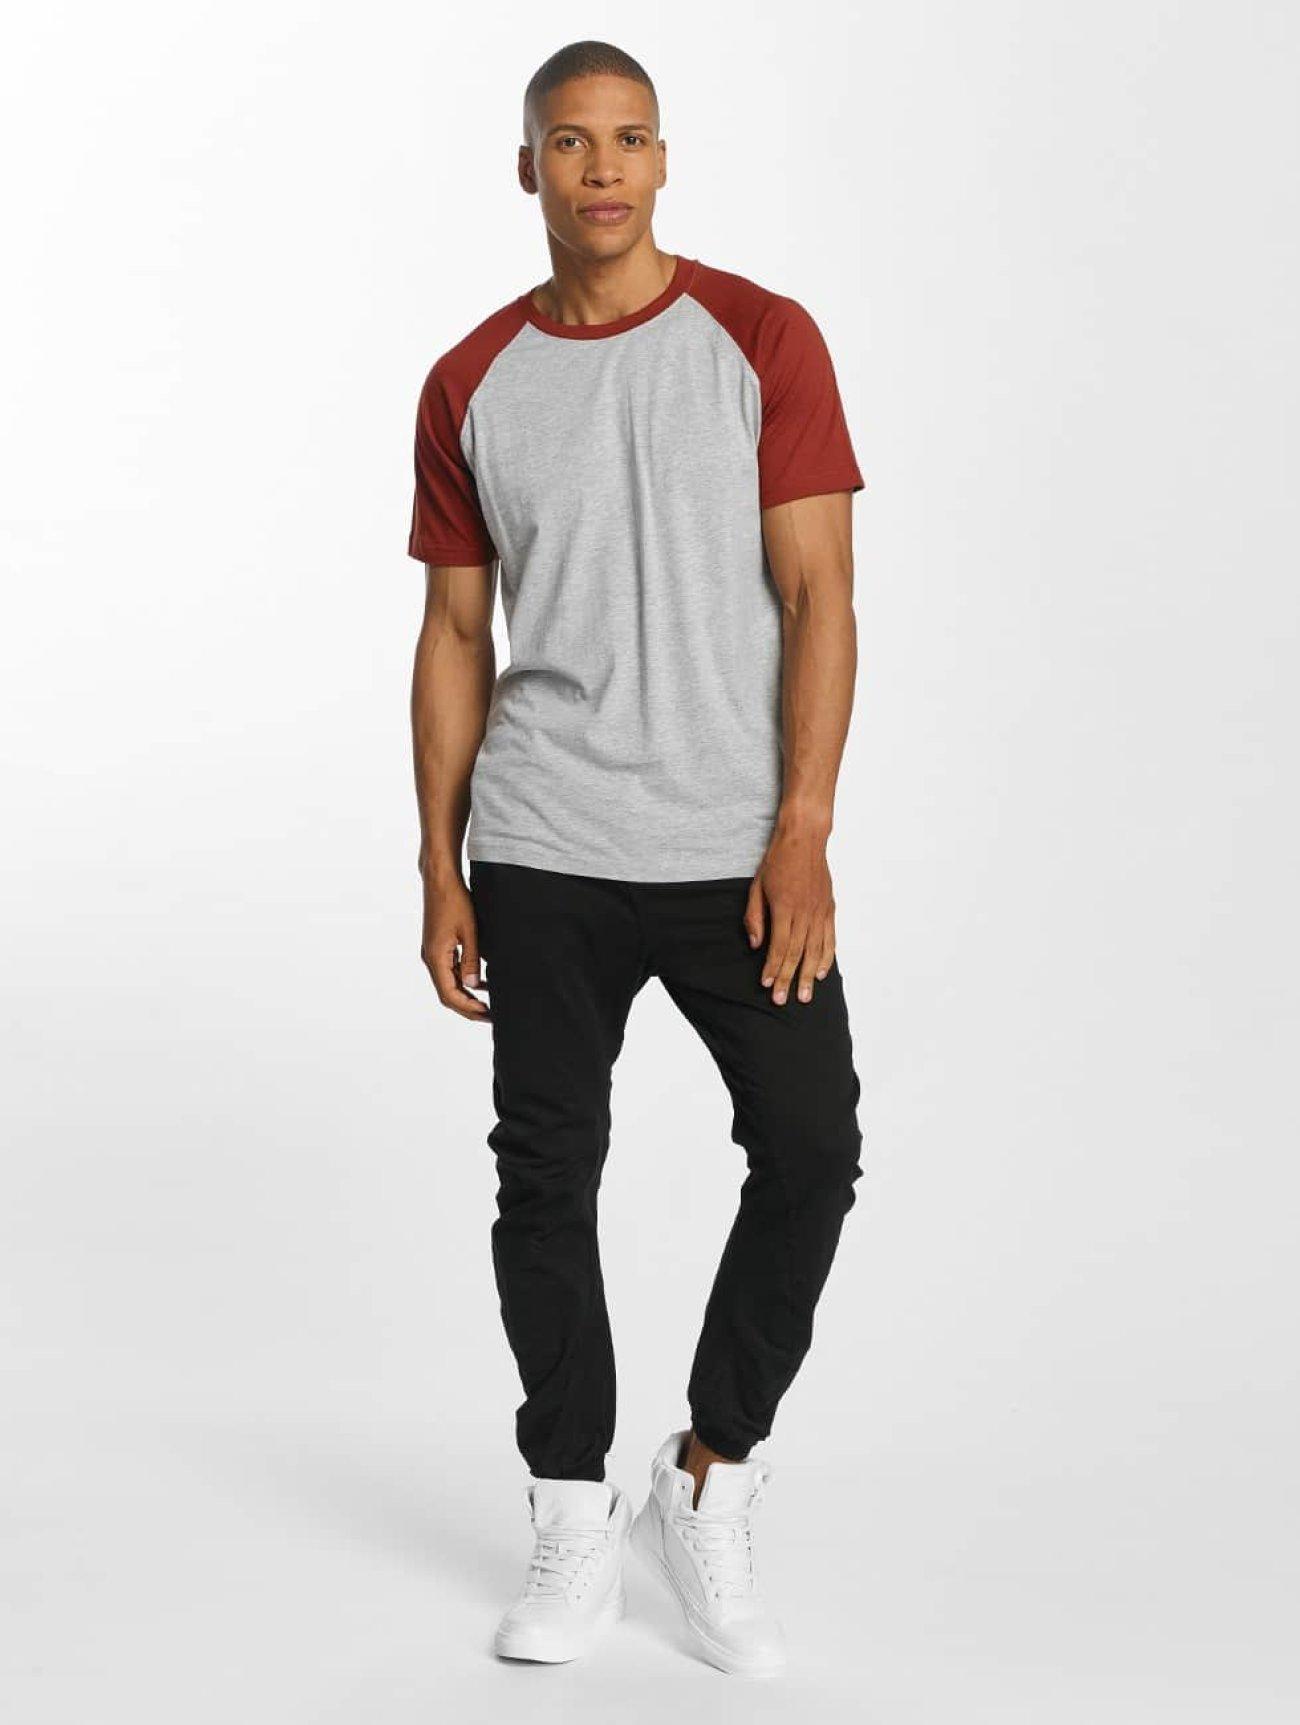 Urban Classics | Raglan Contrast  gris Homme T-Shirt  401243| Homme Hauts